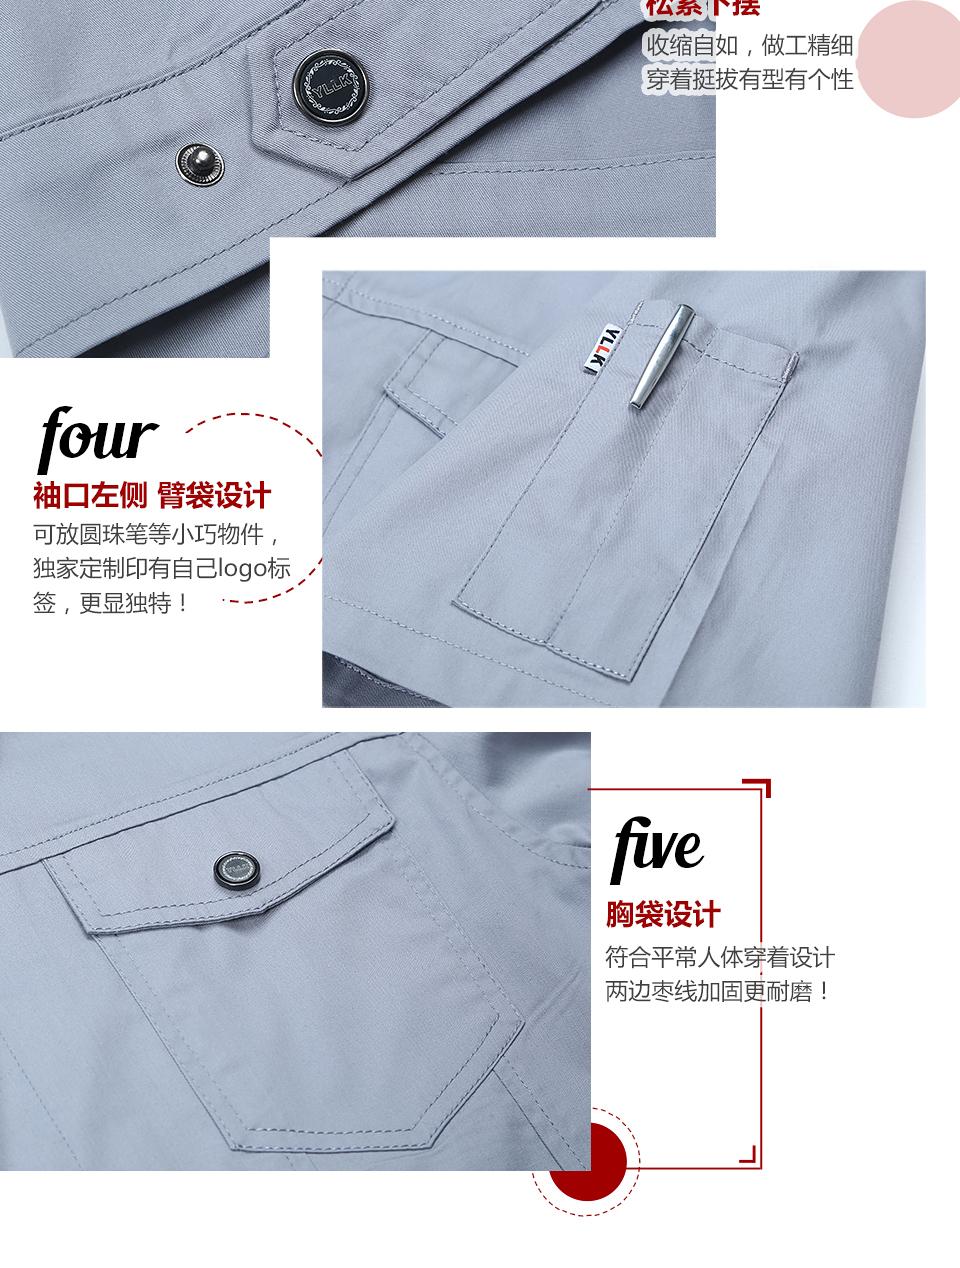 深蓝色FY606夏季工作服